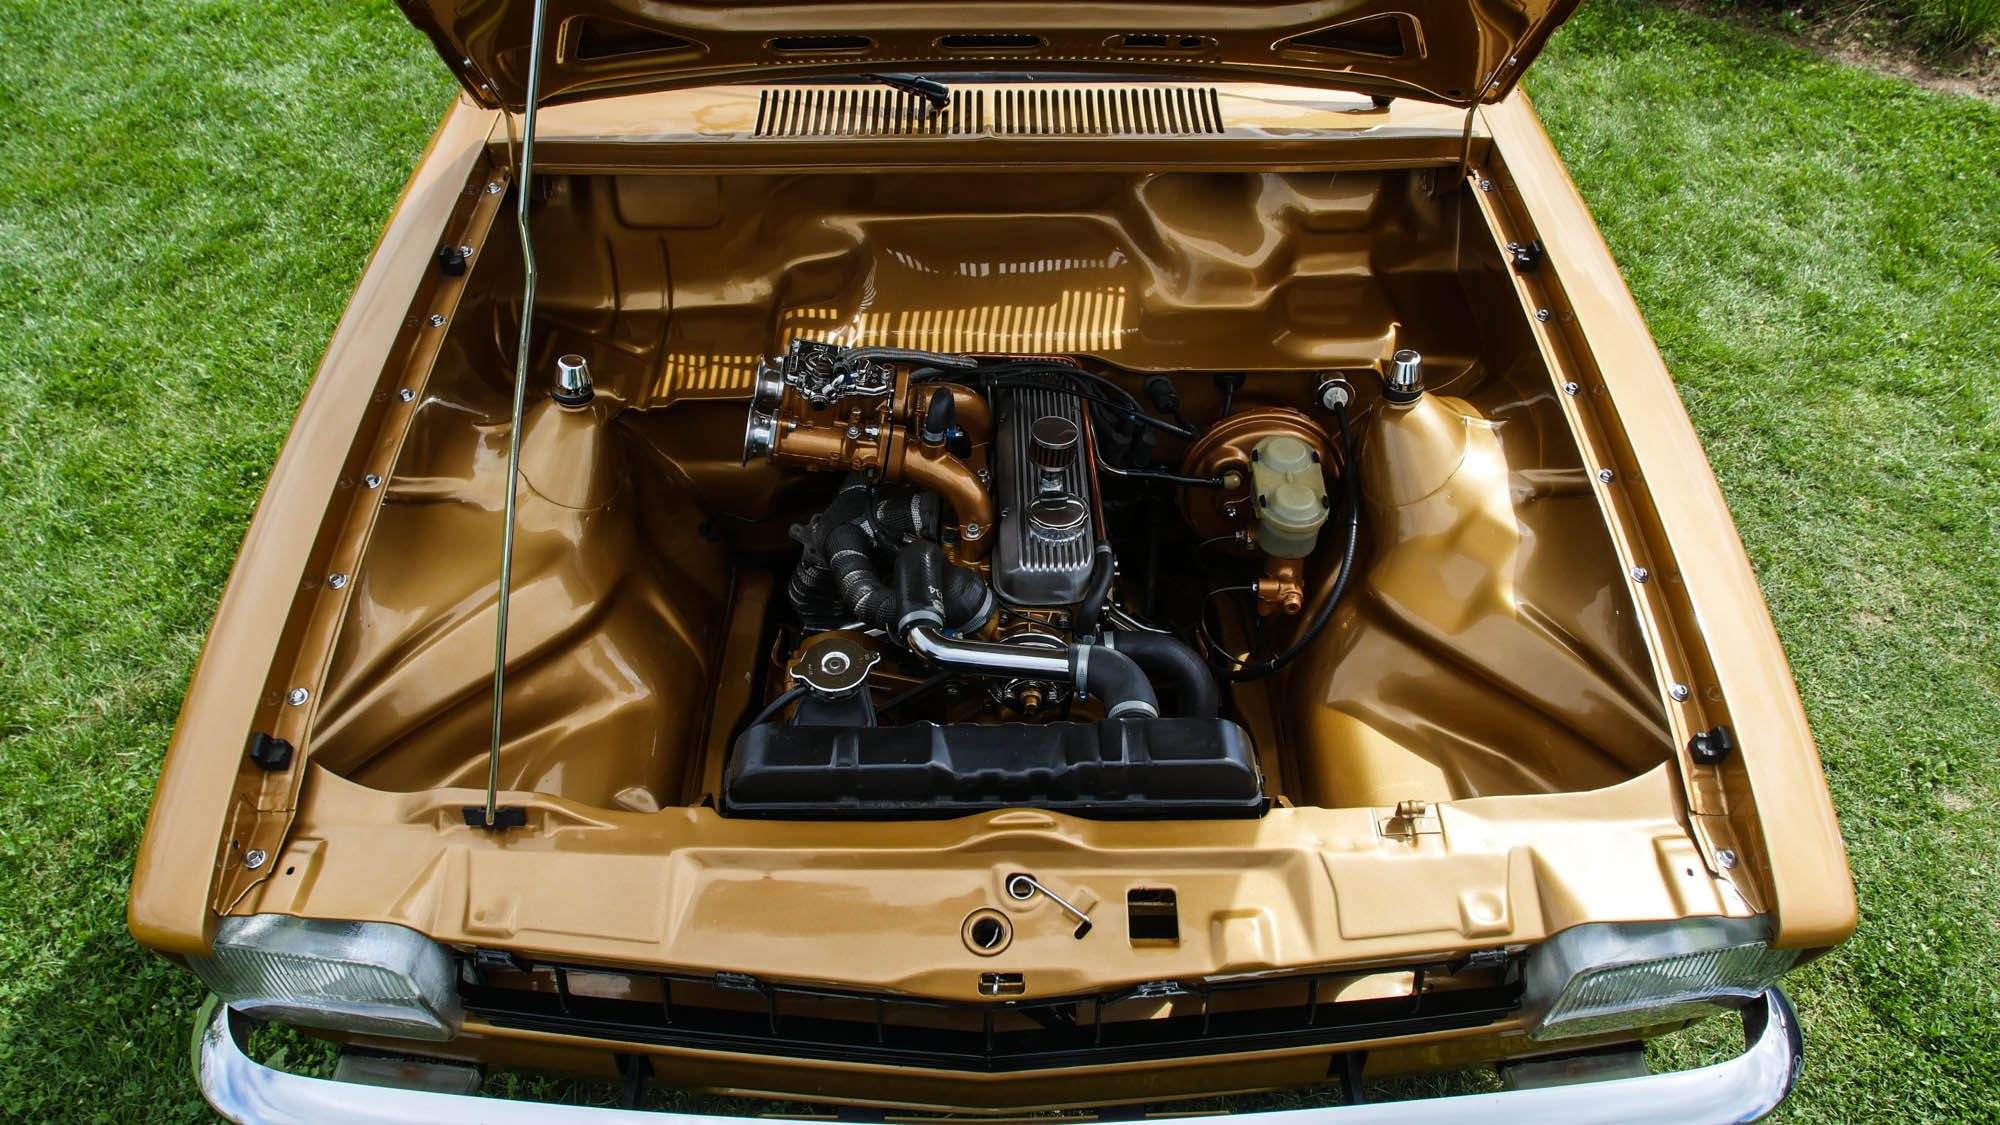 Komplett cleaner Motorraum des Opel Kadett C Caravan